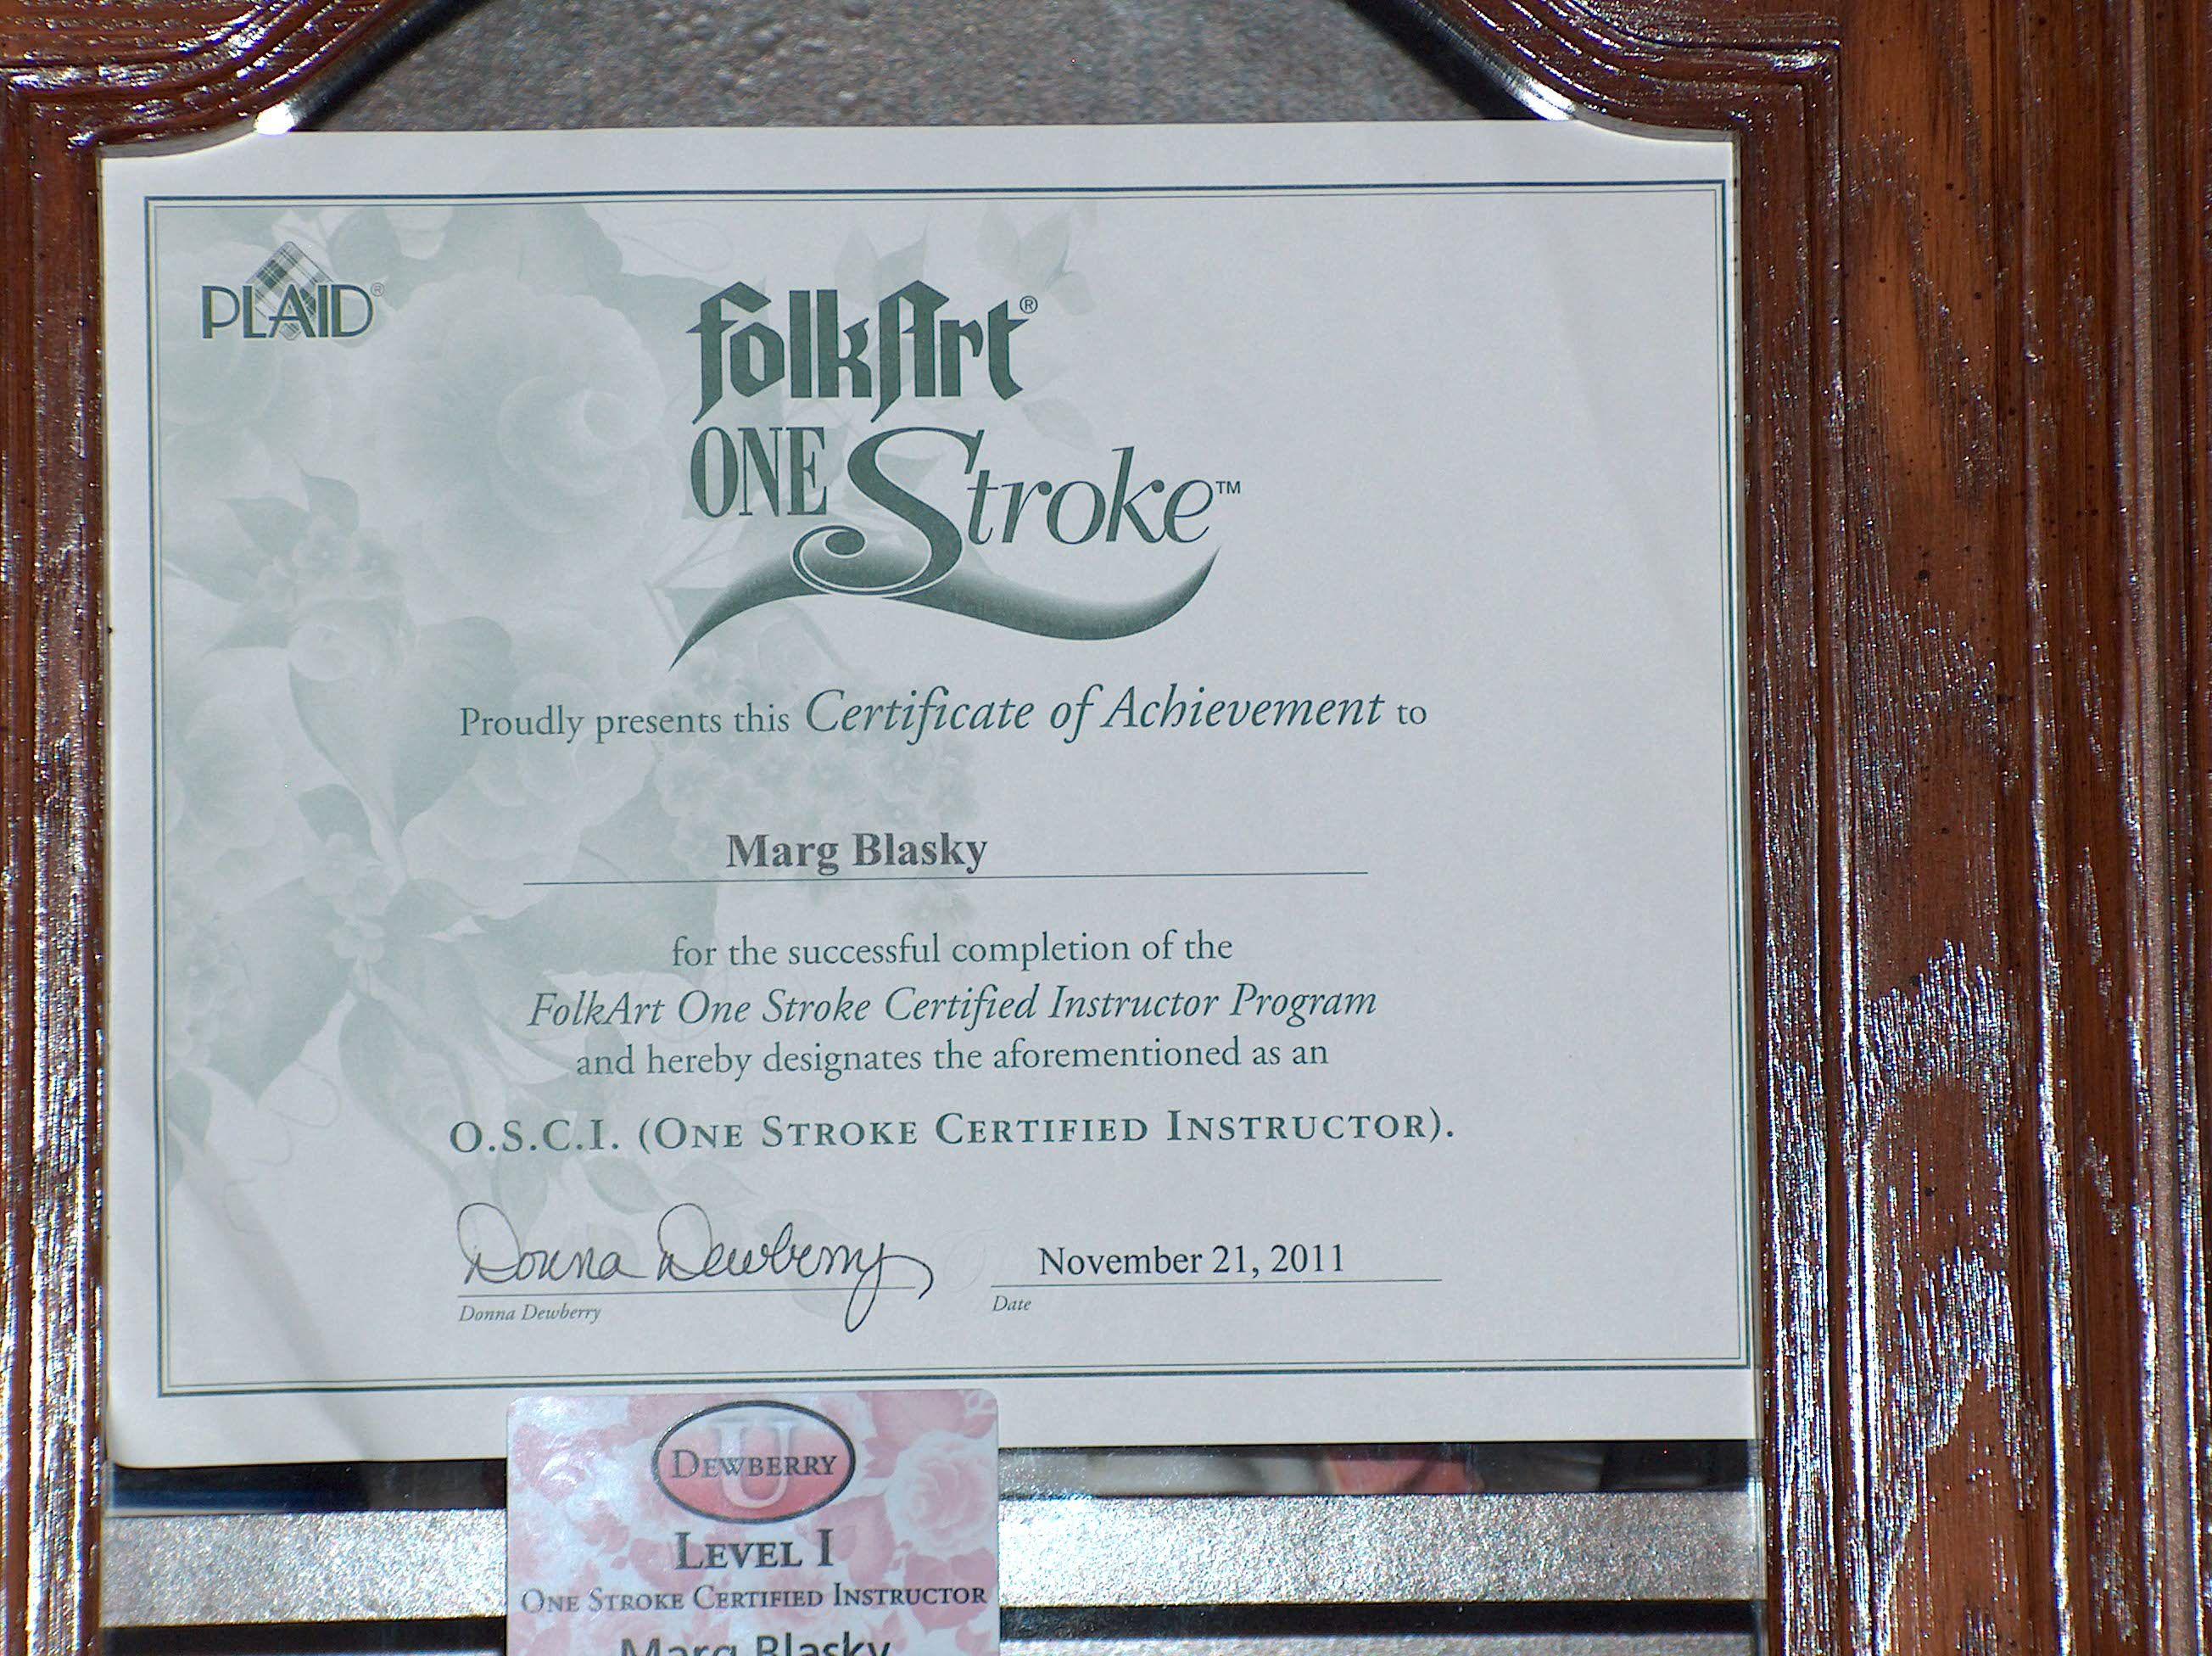 certificate teacher certification teaching texas achievement apostille education